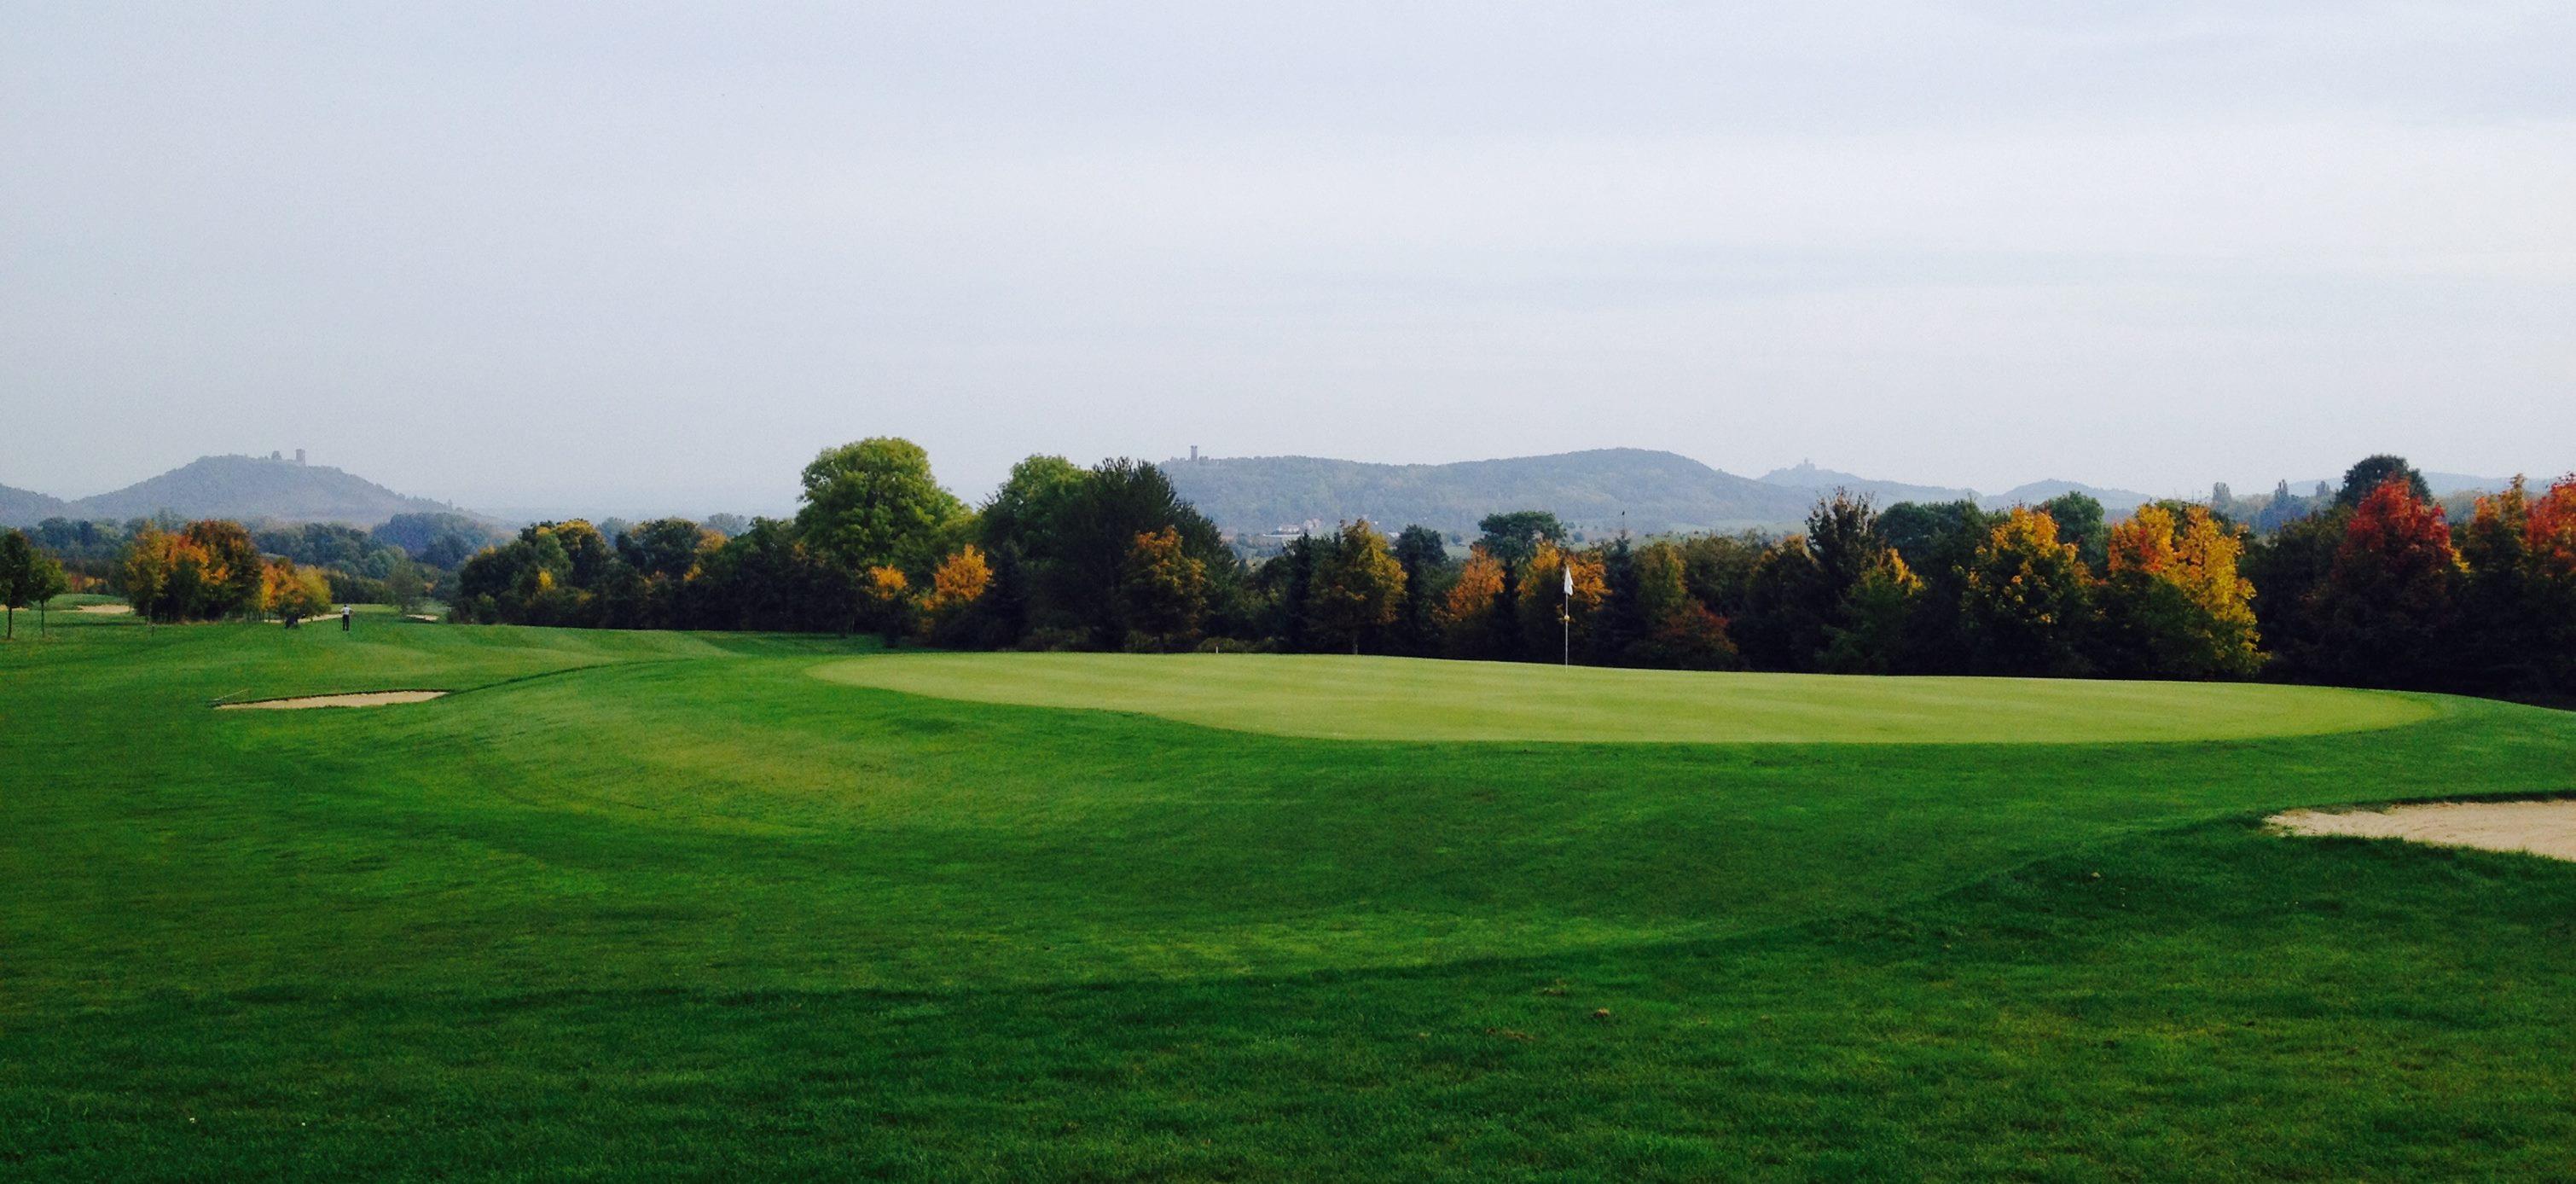 Overview of golf course named Drei Gleichen Golf Club